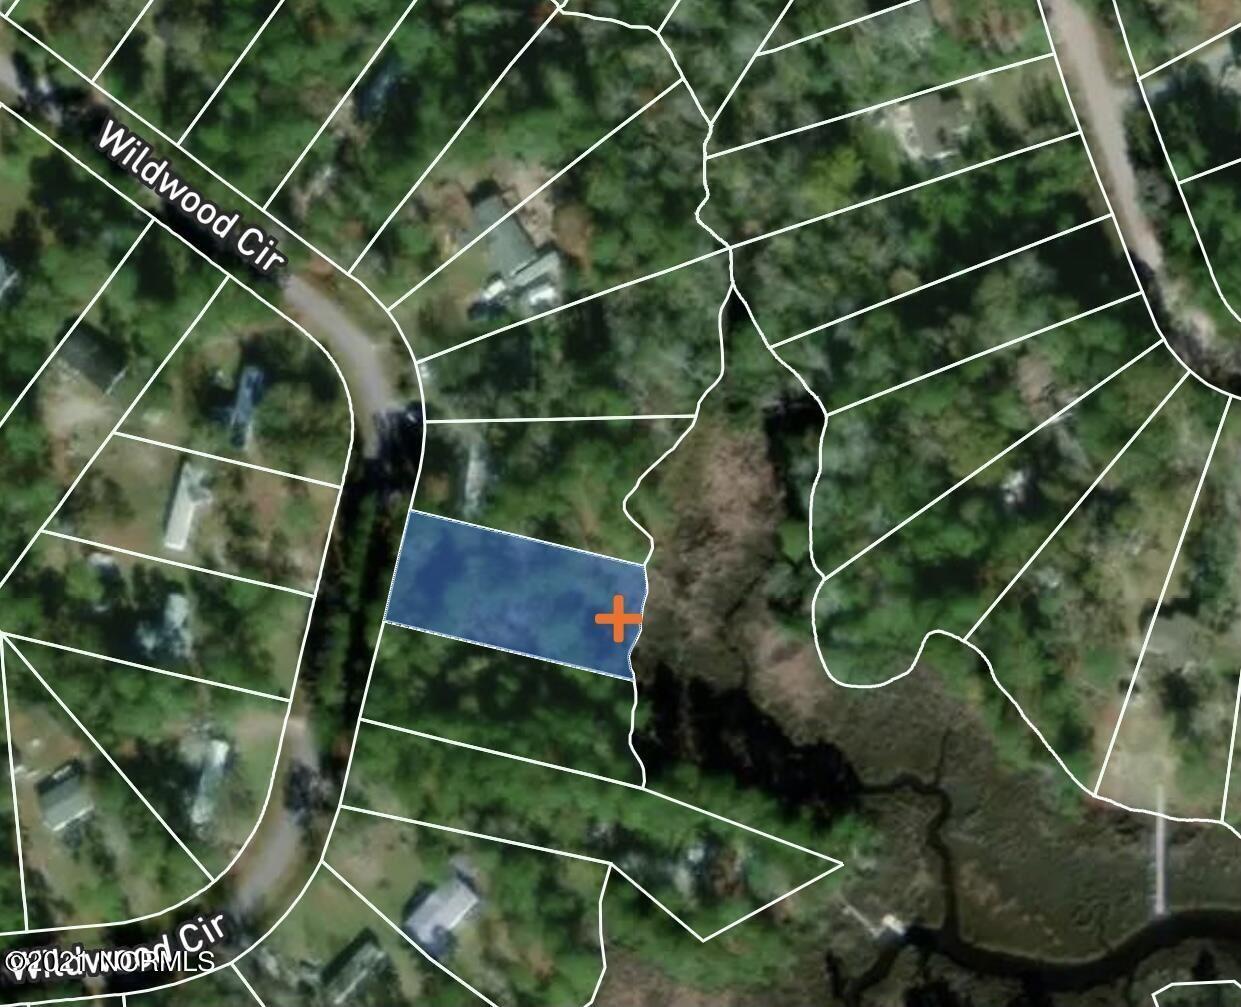 Photo of Lot 64 Wildwood Circle, Hampstead, NC 28443 (MLS # 100266670)